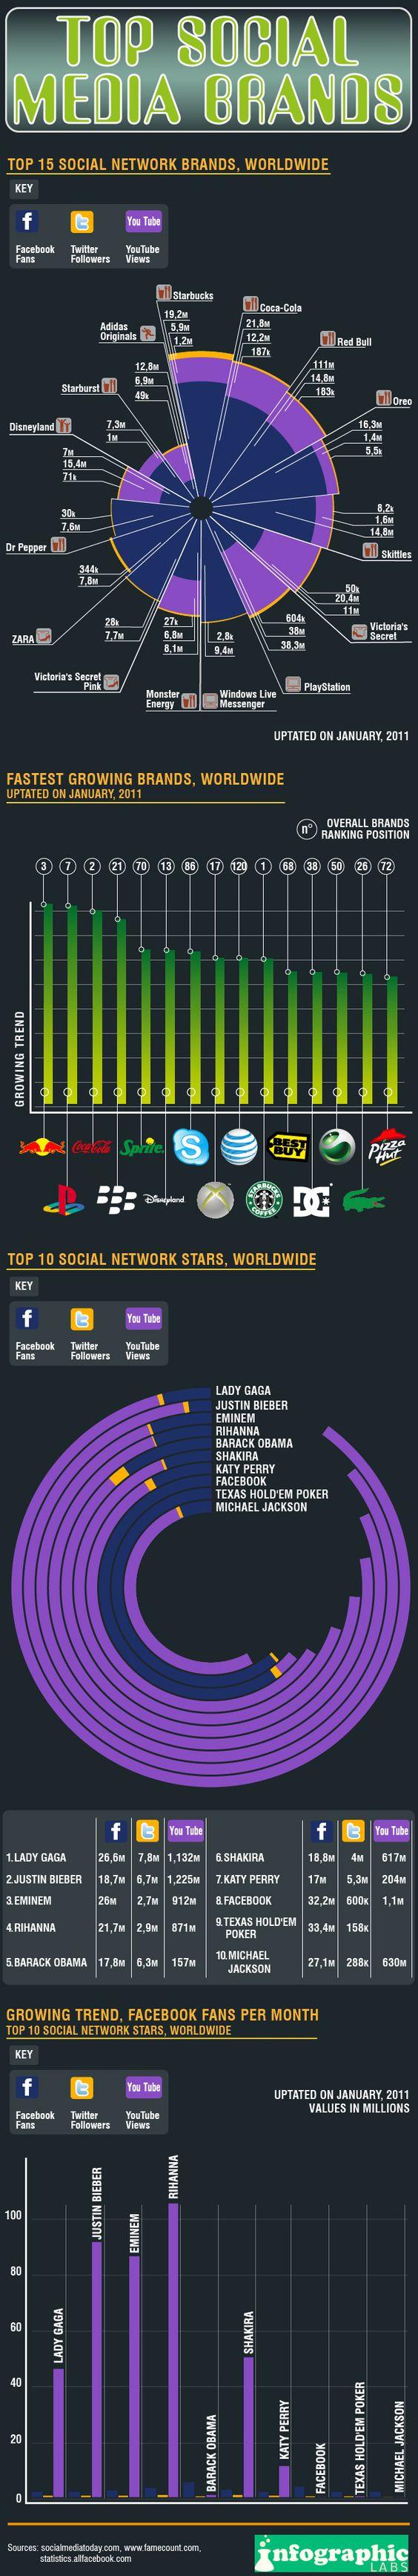 Top Social Media Brands: top 15 social networking brands worldwide